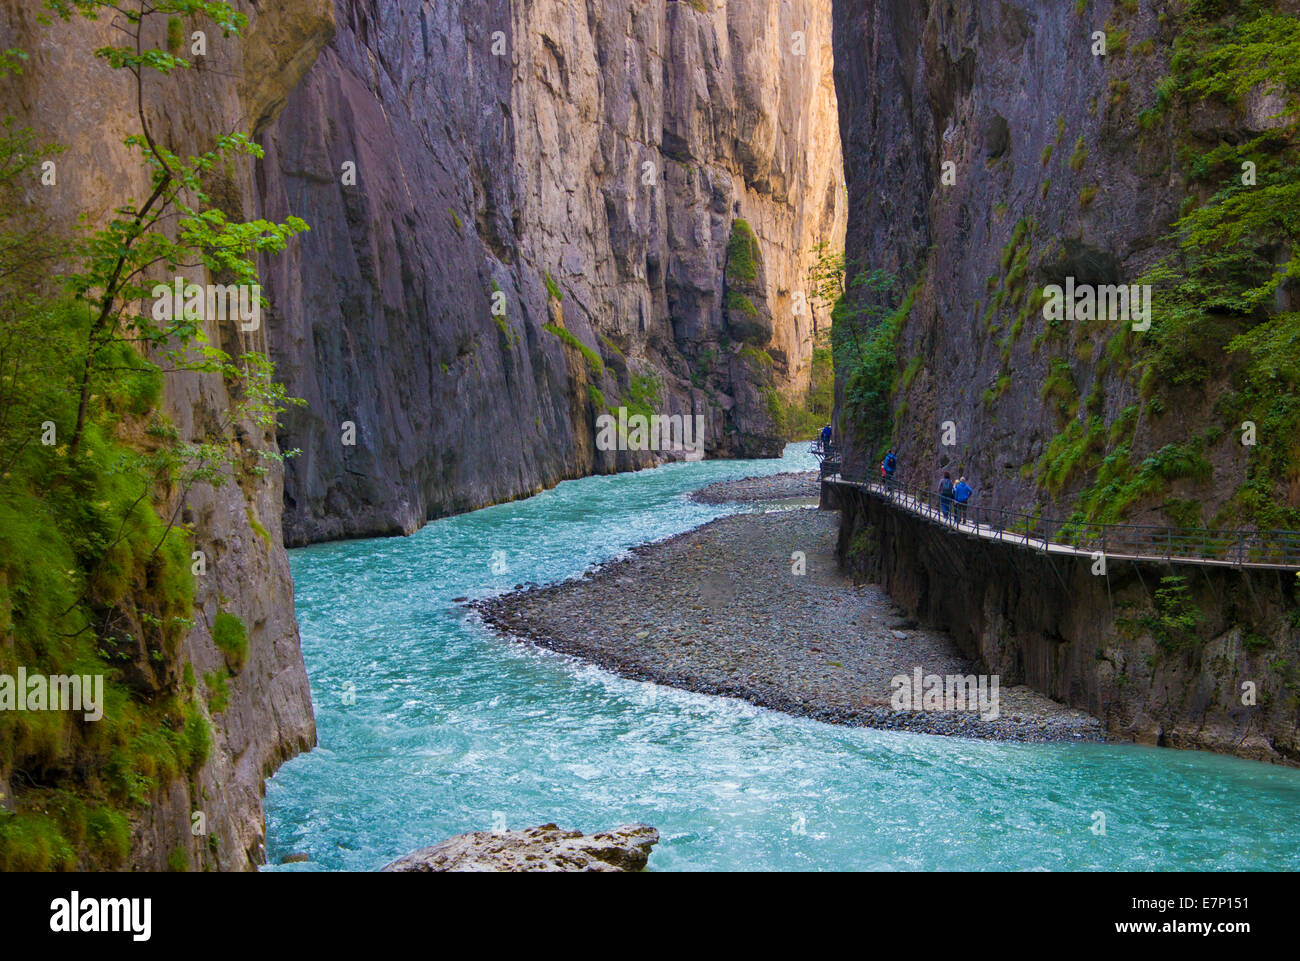 Aare, Schlucht, Schlucht, Schweiz, Europa, Geologie, grün, Natur, Park, Fluss, Felsen, Frühling, touristische, Stockbild